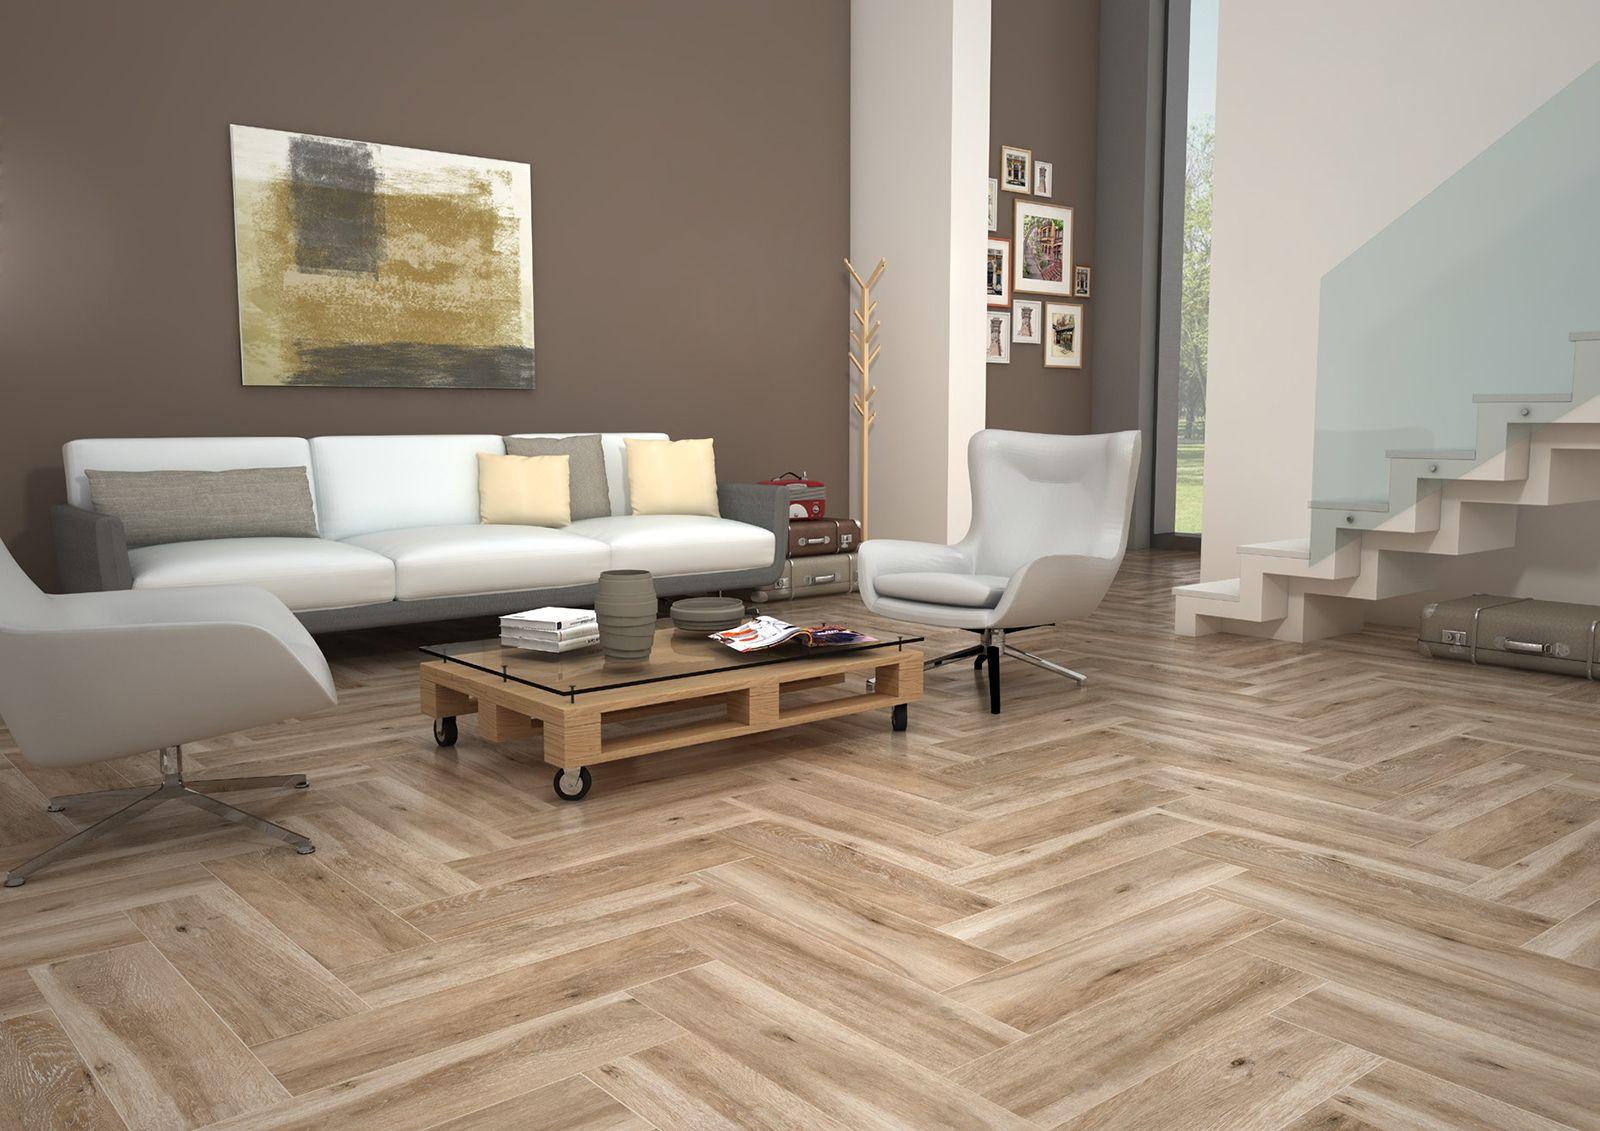 Myr ceramica denver pinterest denver myr ceramica denver ceramic flooringwood tilesdenver dailygadgetfo Choice Image